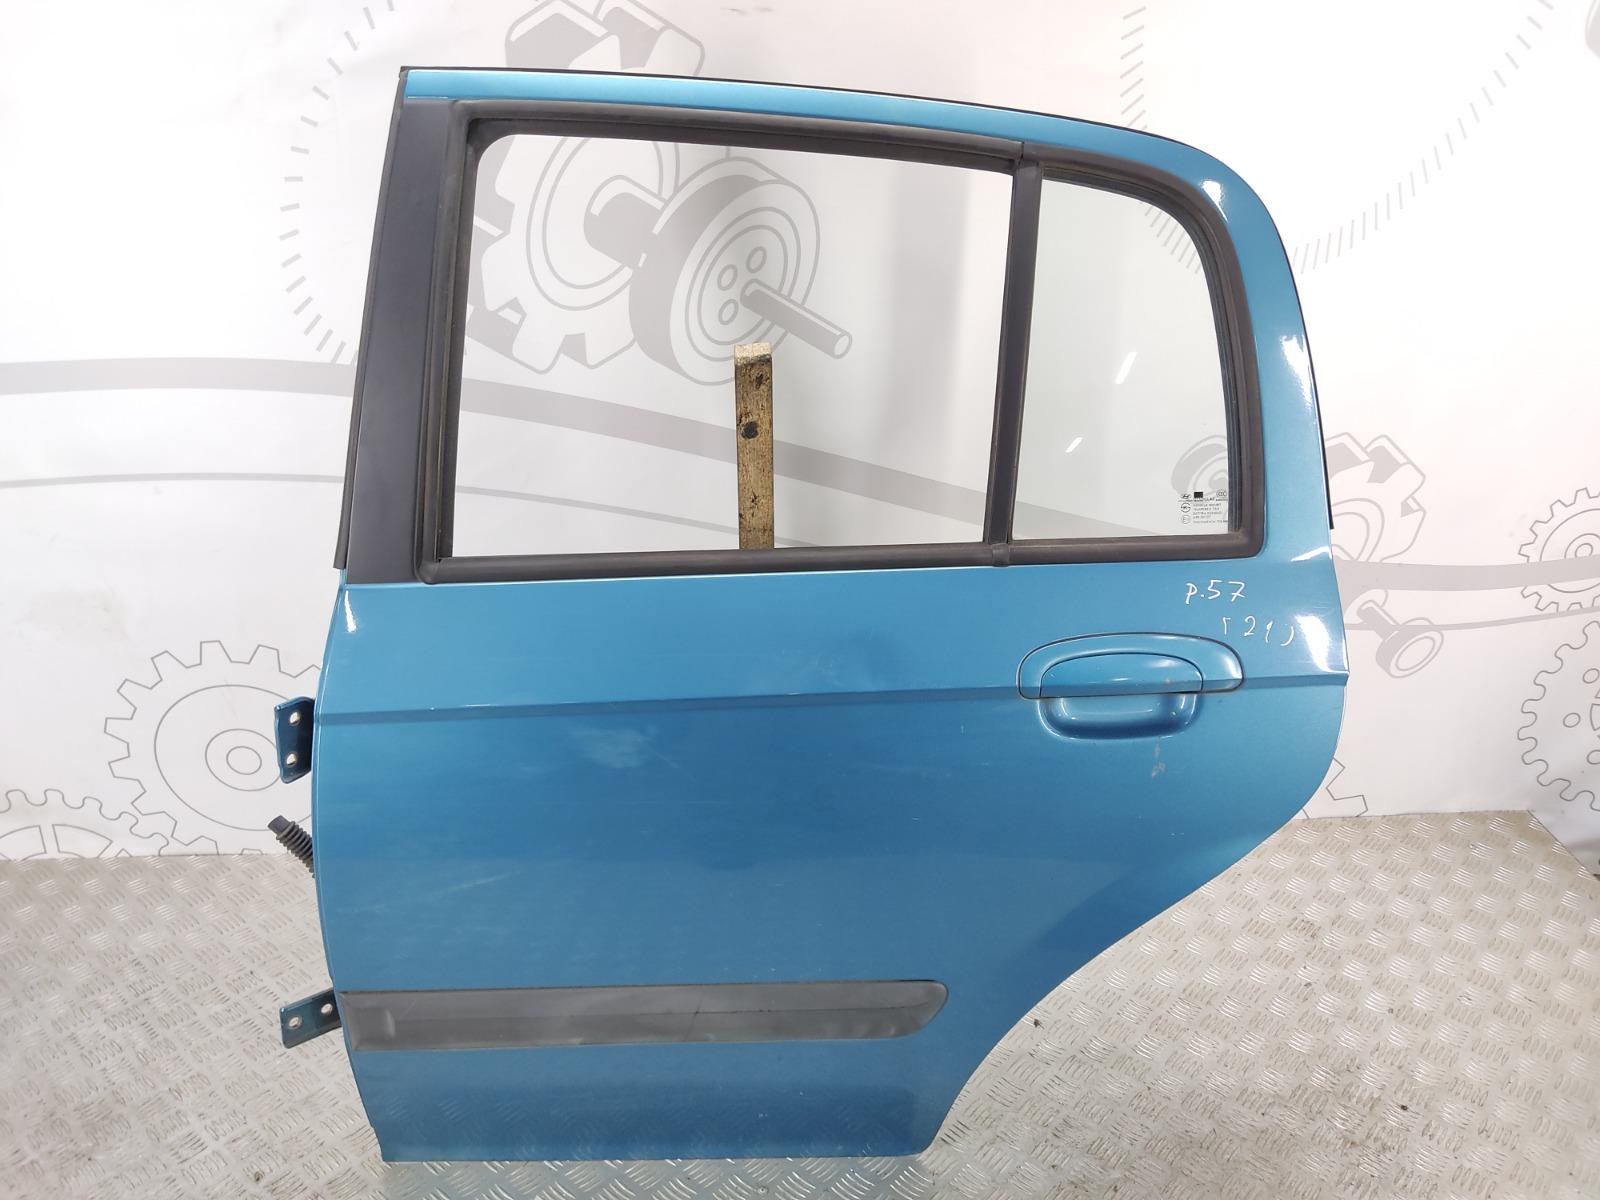 Дверь задняя левая Hyundai Getz 1.3 I 2004 (б/у)